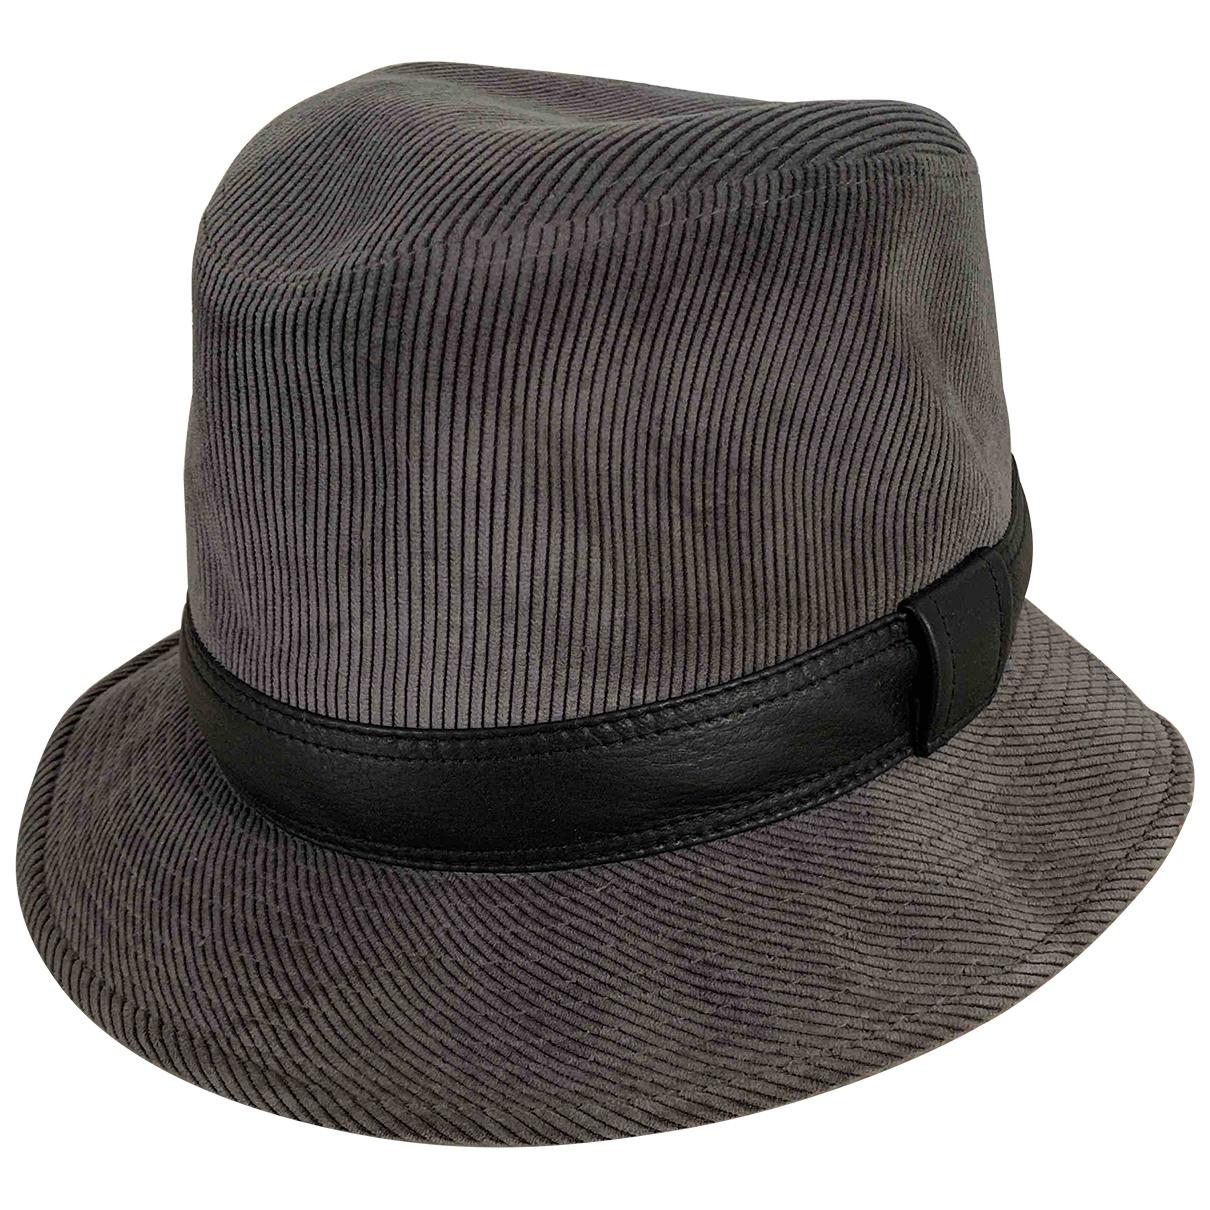 Hermès \N Anthracite hat for Women 58 cm